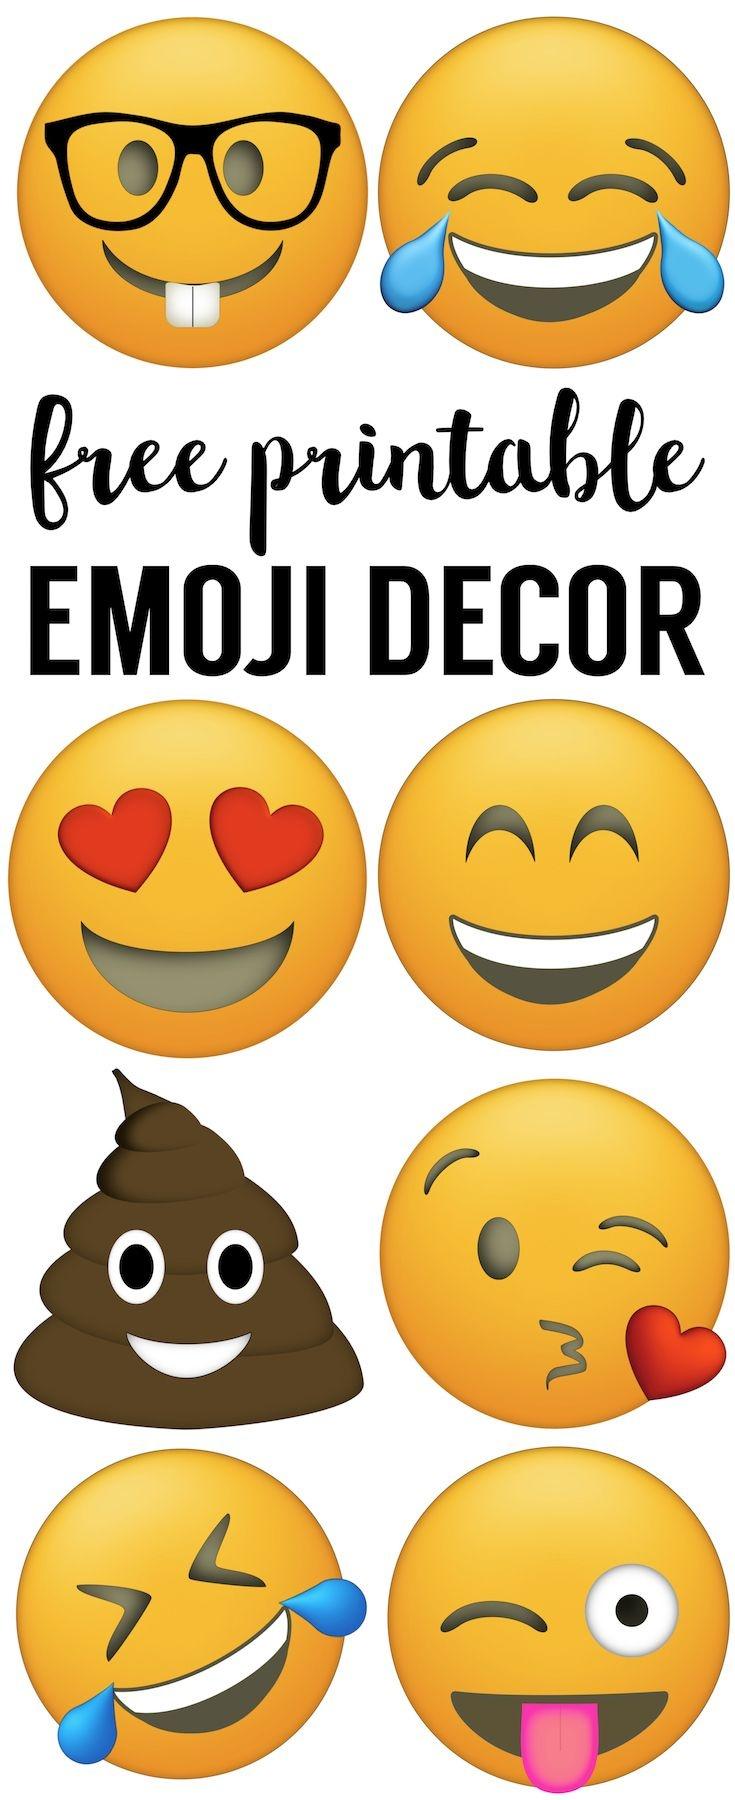 Emoji Faces Printable {Free Emoji Printables} | Kingston Emoji - Free Emoji Party Printables